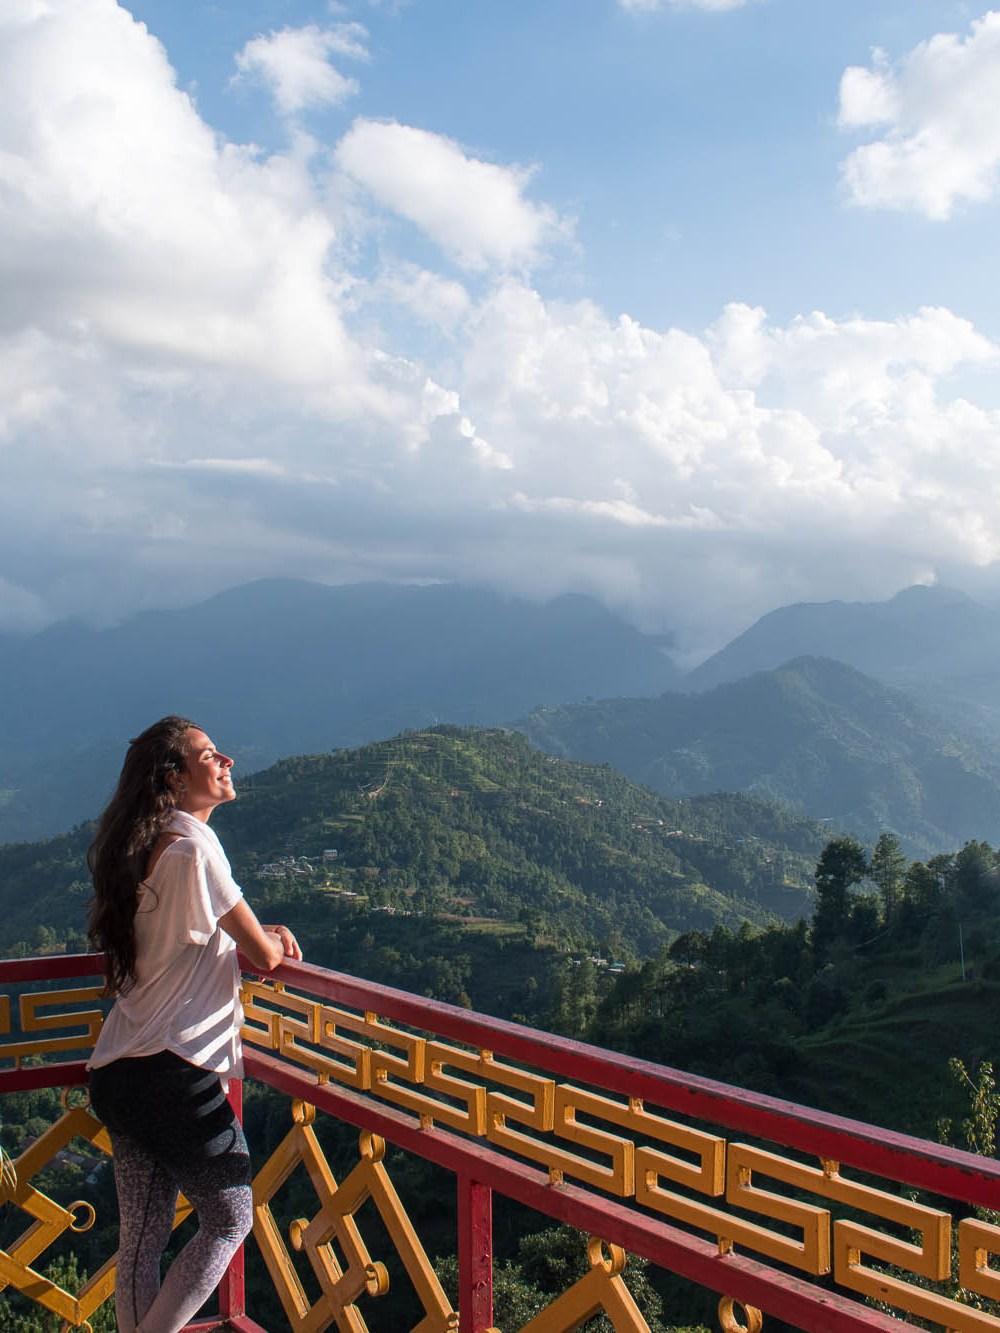 Monastério Namobuddha no Nepal - Experiência imperdível no Vale do Kathmandu